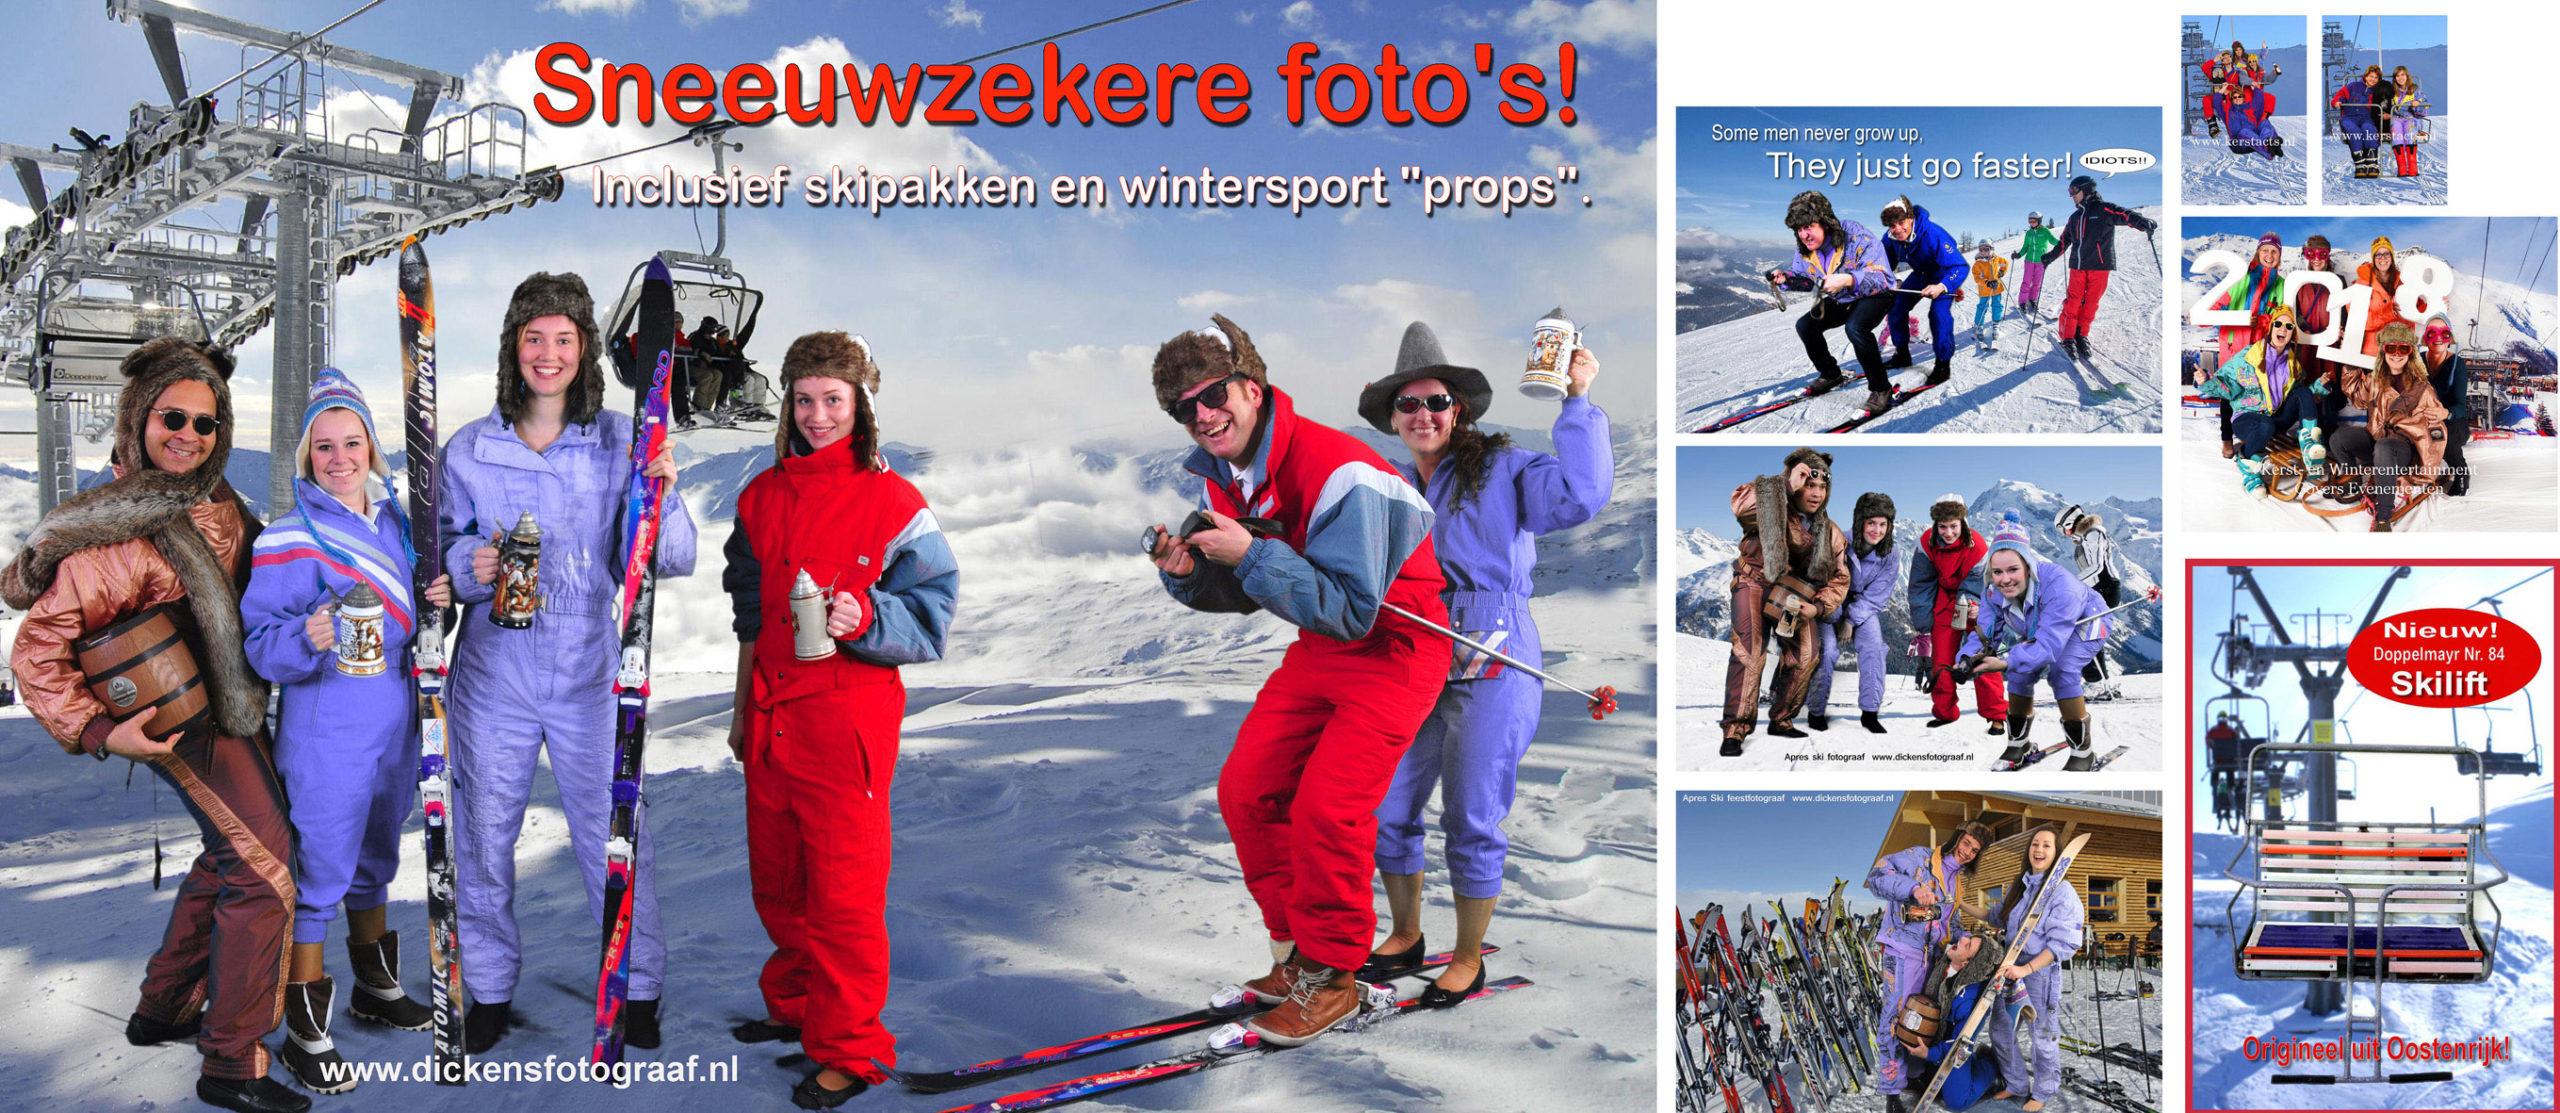 Après ski entertainment ? Apres ski funparty fotograaf !!! Kerstfotografie, Kerstfoto's, winterfotografie, funfotografie, Arrenslee foto, op de foto, Kerstacts, Kerstact, Kerstparty, Kerstfeest op de foto, Wintersport fun fotografie, dickensfotograaf, Dickensfotografie